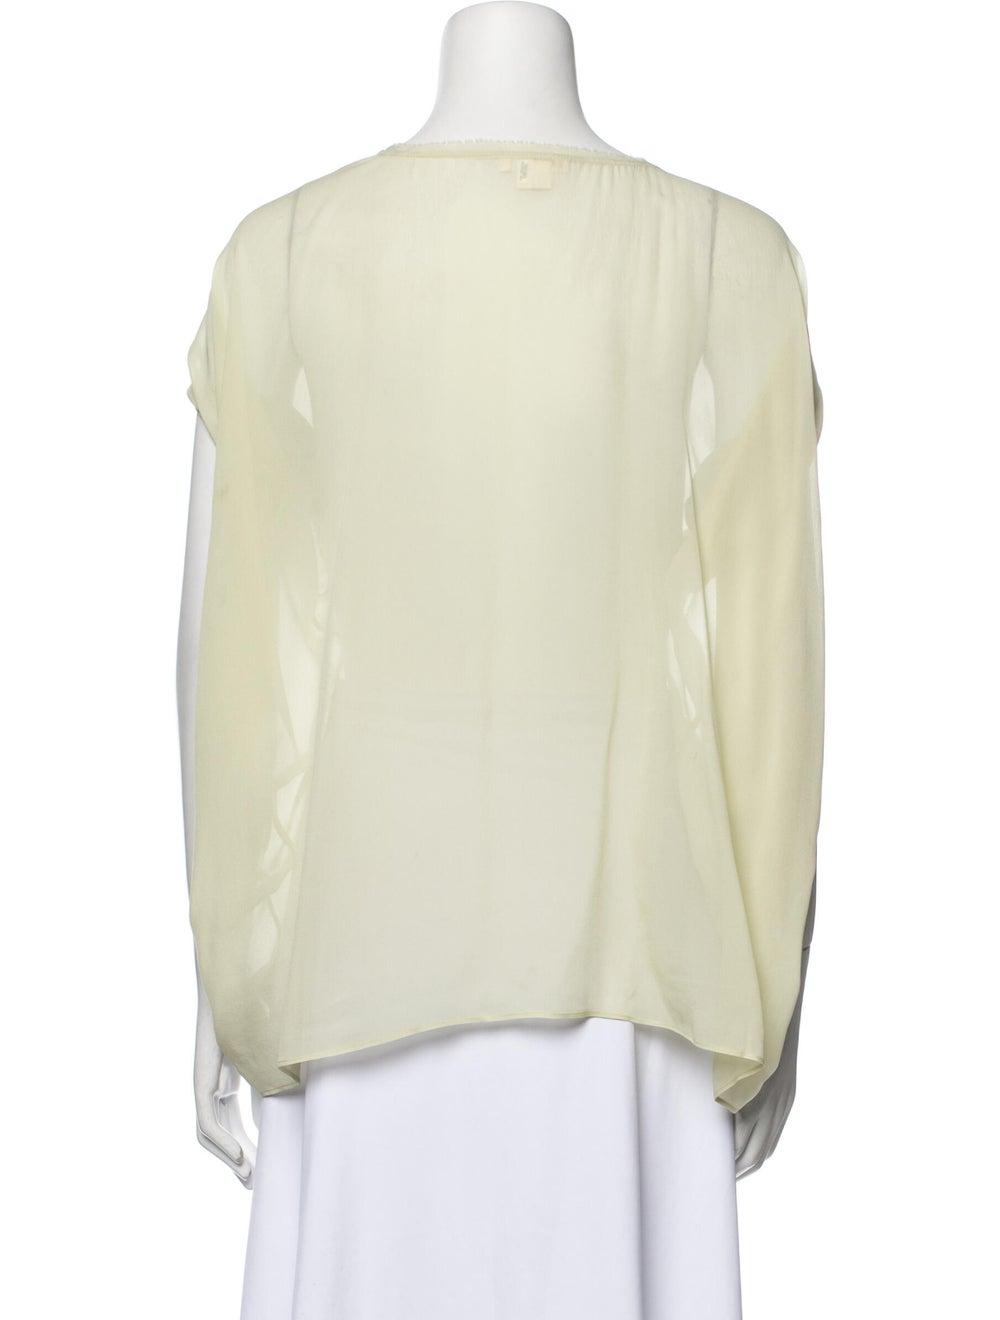 Helmut Lang Silk Scoop Neck T-Shirt Green - image 3